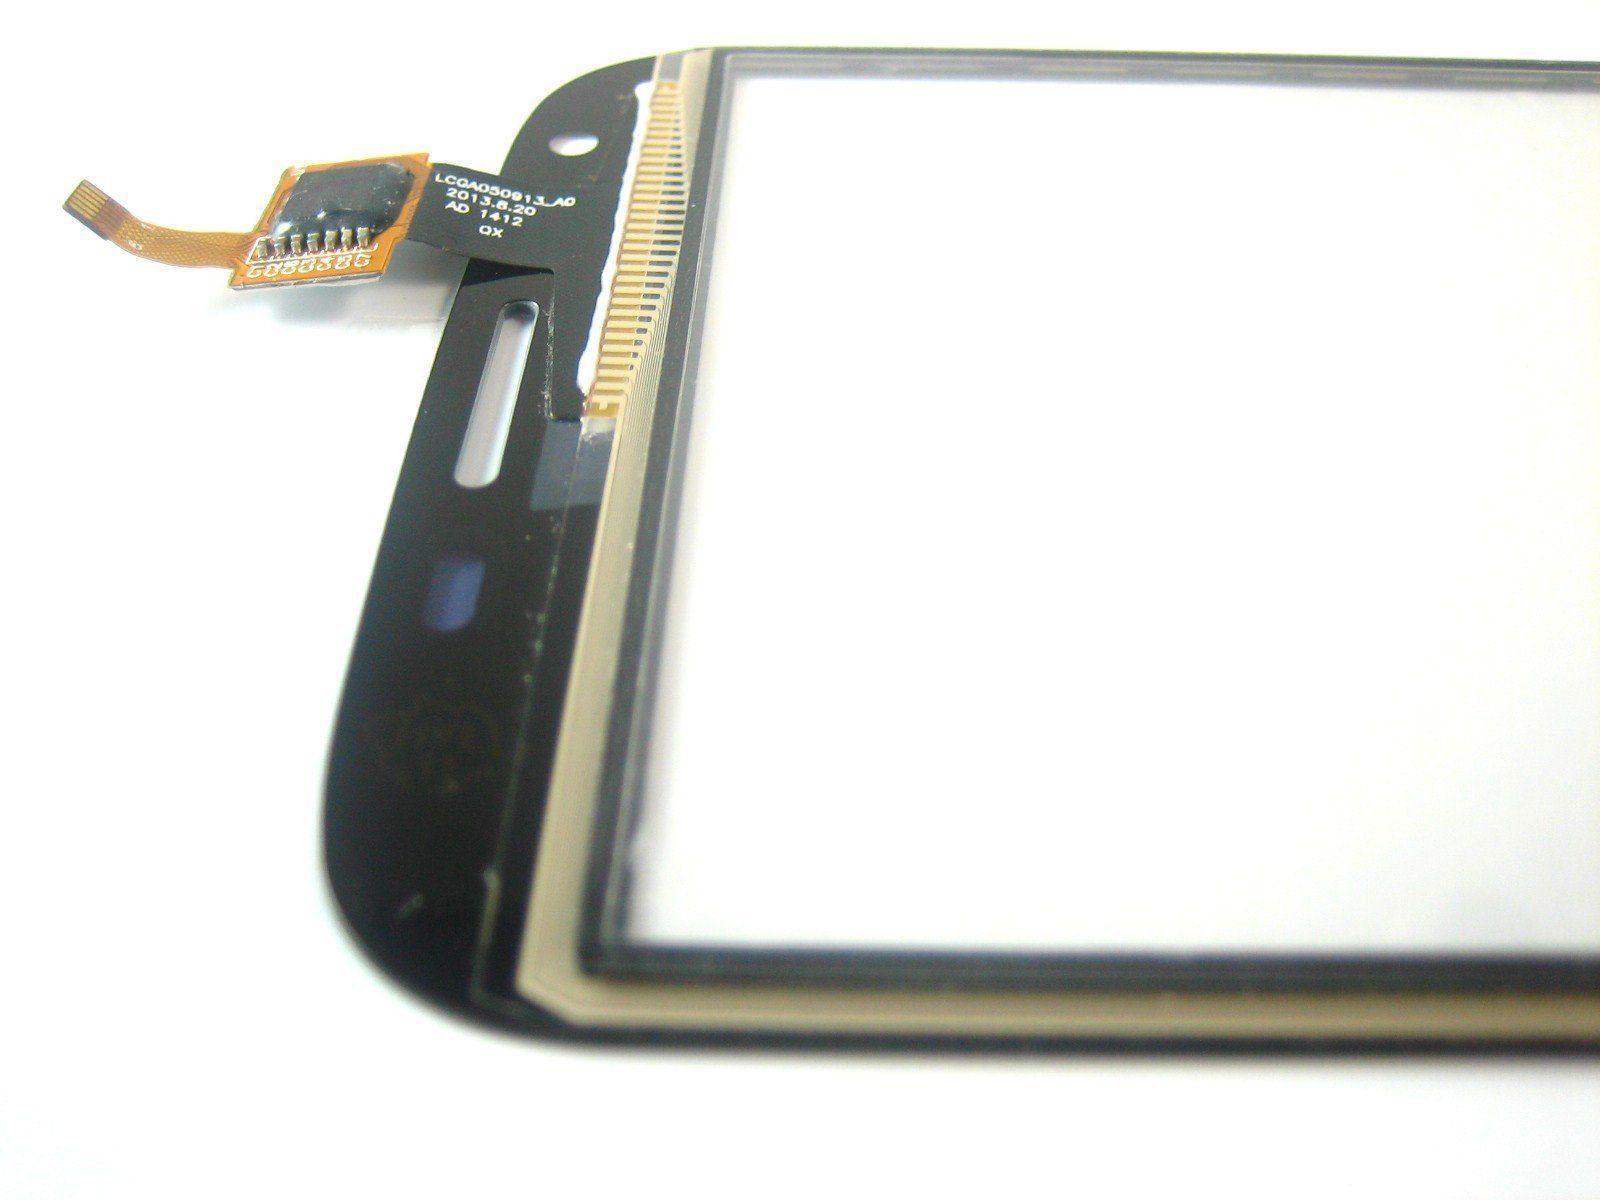 Para Huawei Ascend Y600 Reemplazo LCD Pantalla táctil Vidrio Negro + Herramientas